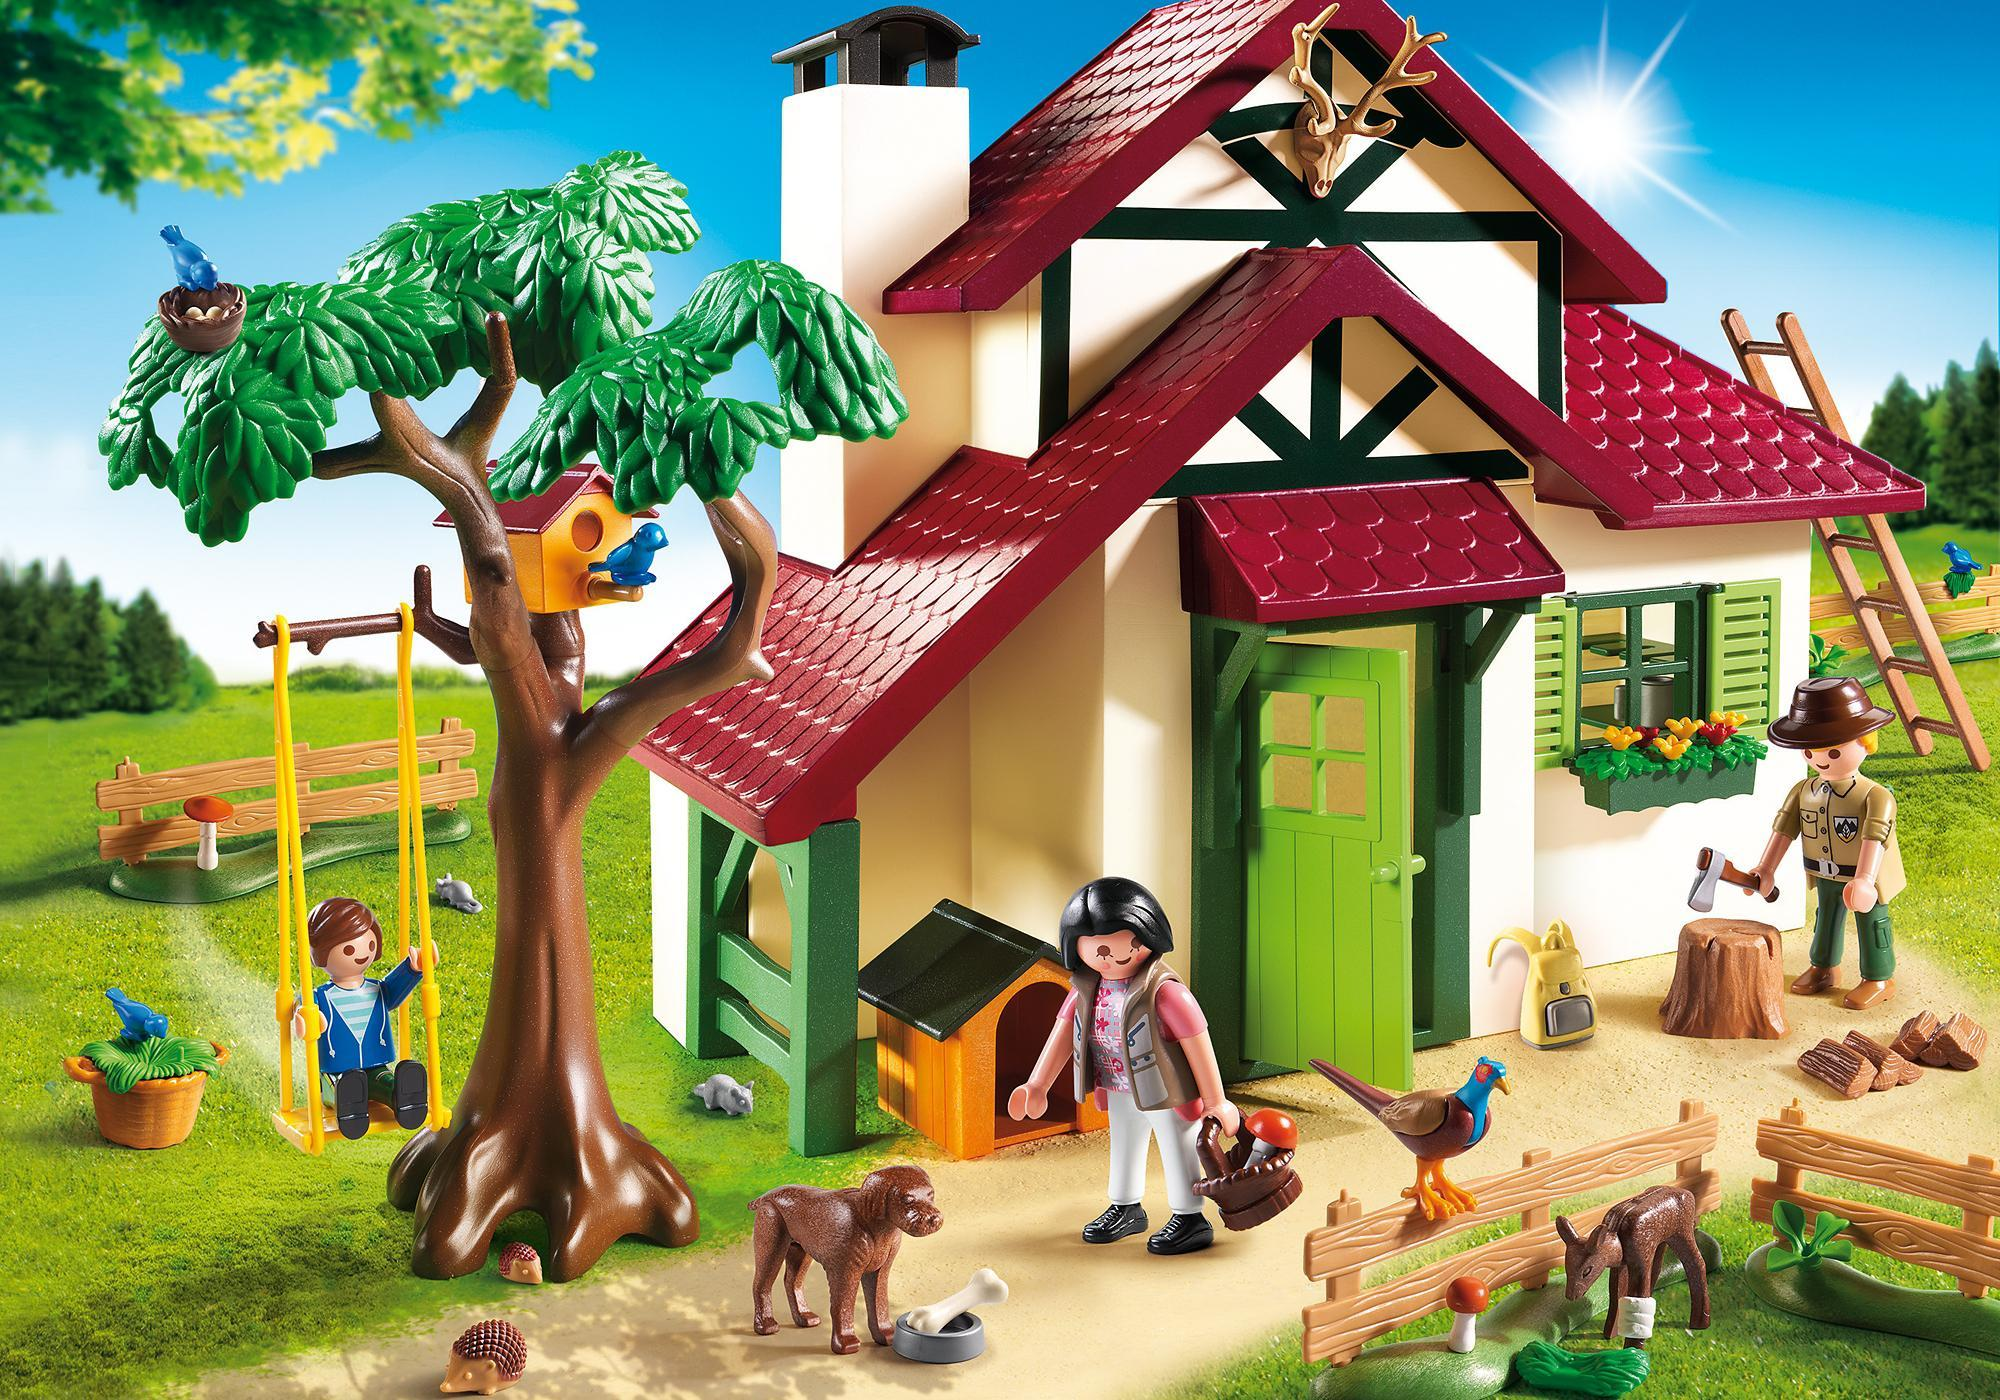 http://media.playmobil.com/i/playmobil/6811_product_detail/Forsthaus